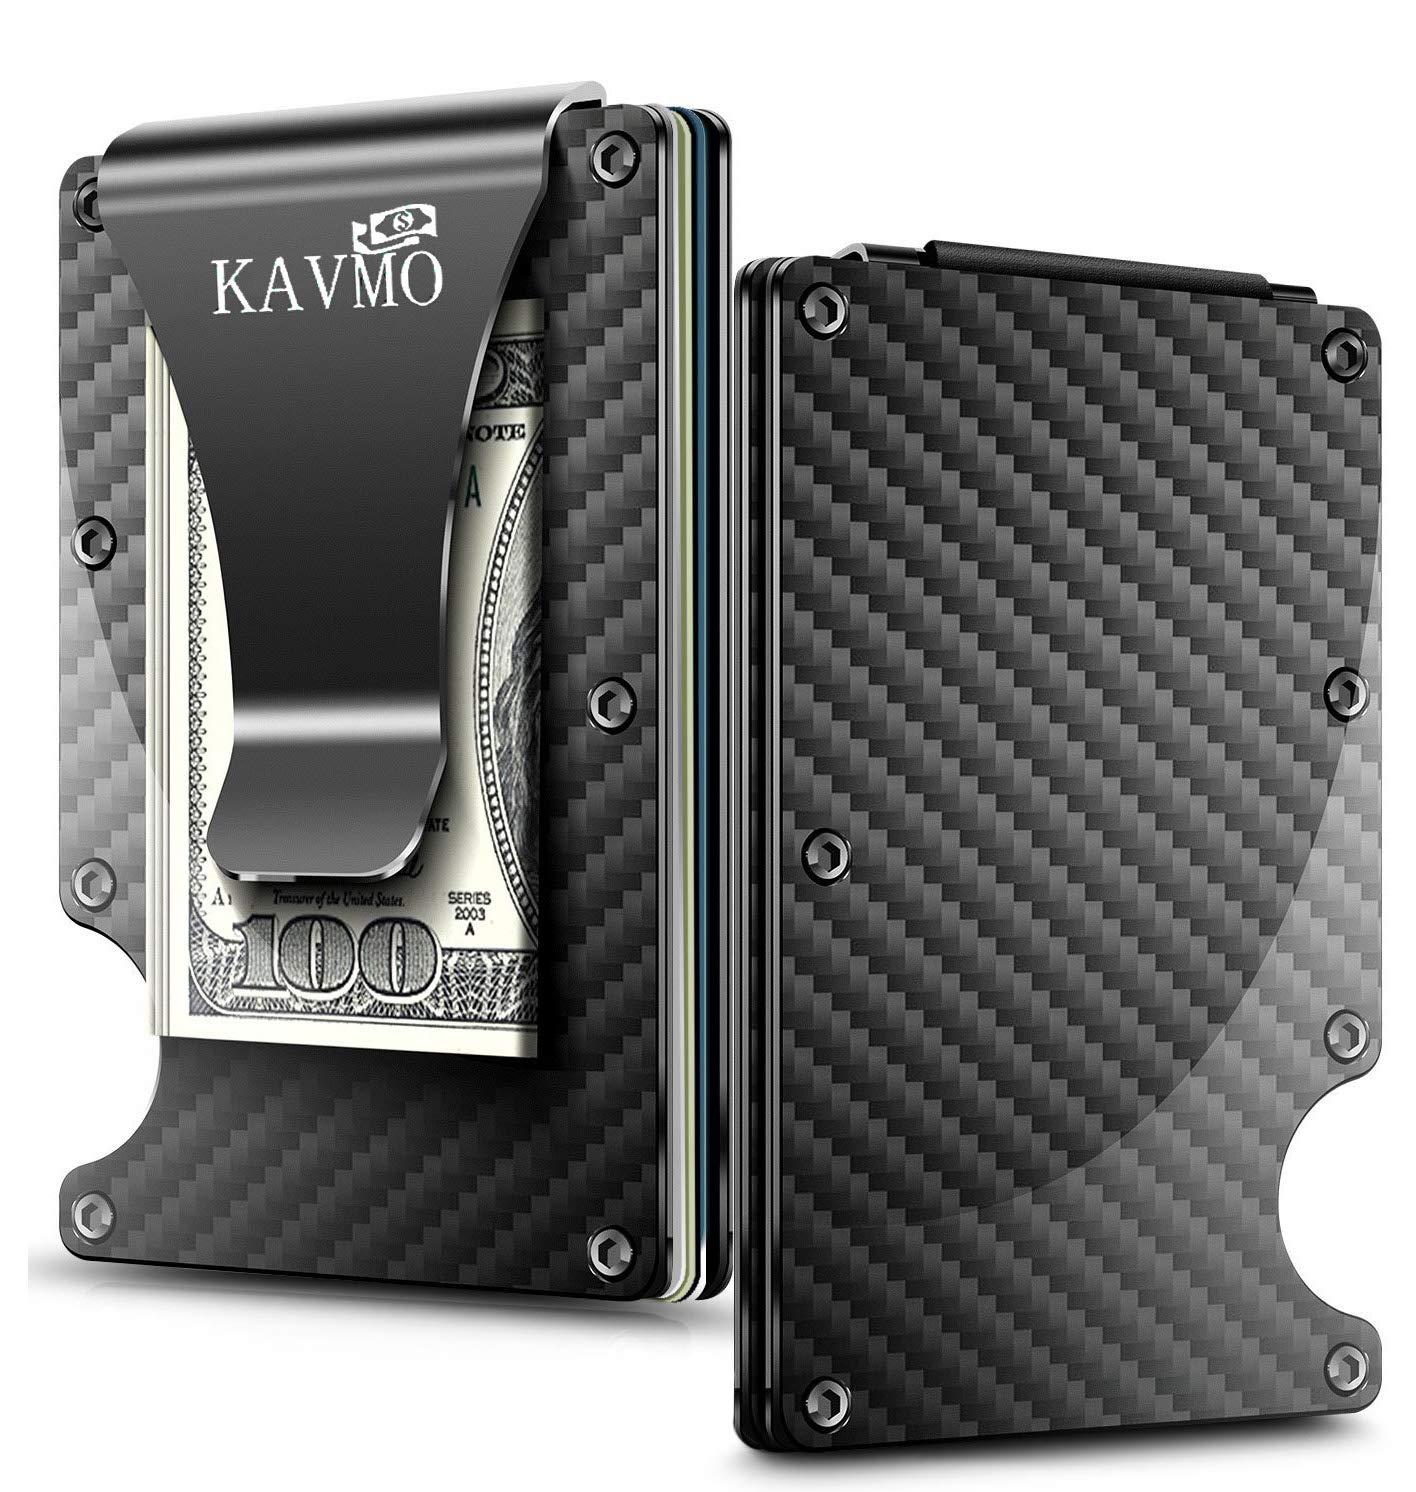 Minimalist Carbon Fiber Wallet, Premium Money Clip & Card Holder, RFID Blocking | Gift for Men and Women.